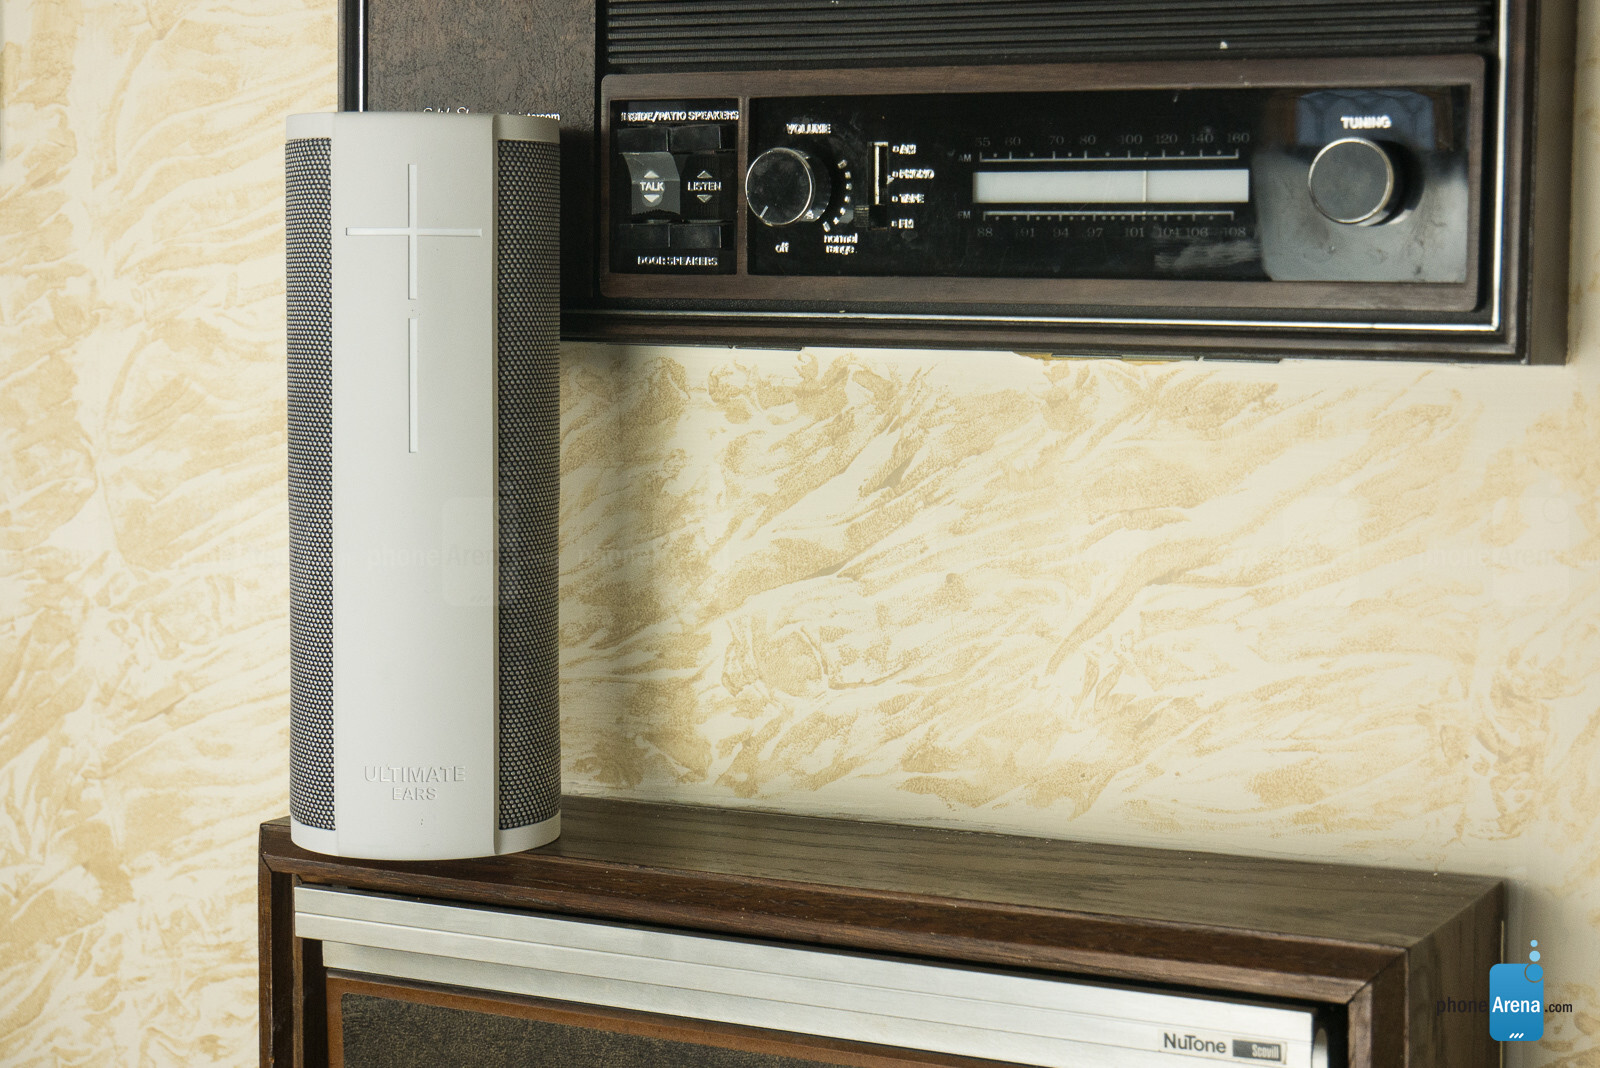 Ue Design Best: UE Megablast Wireless Speaker Review